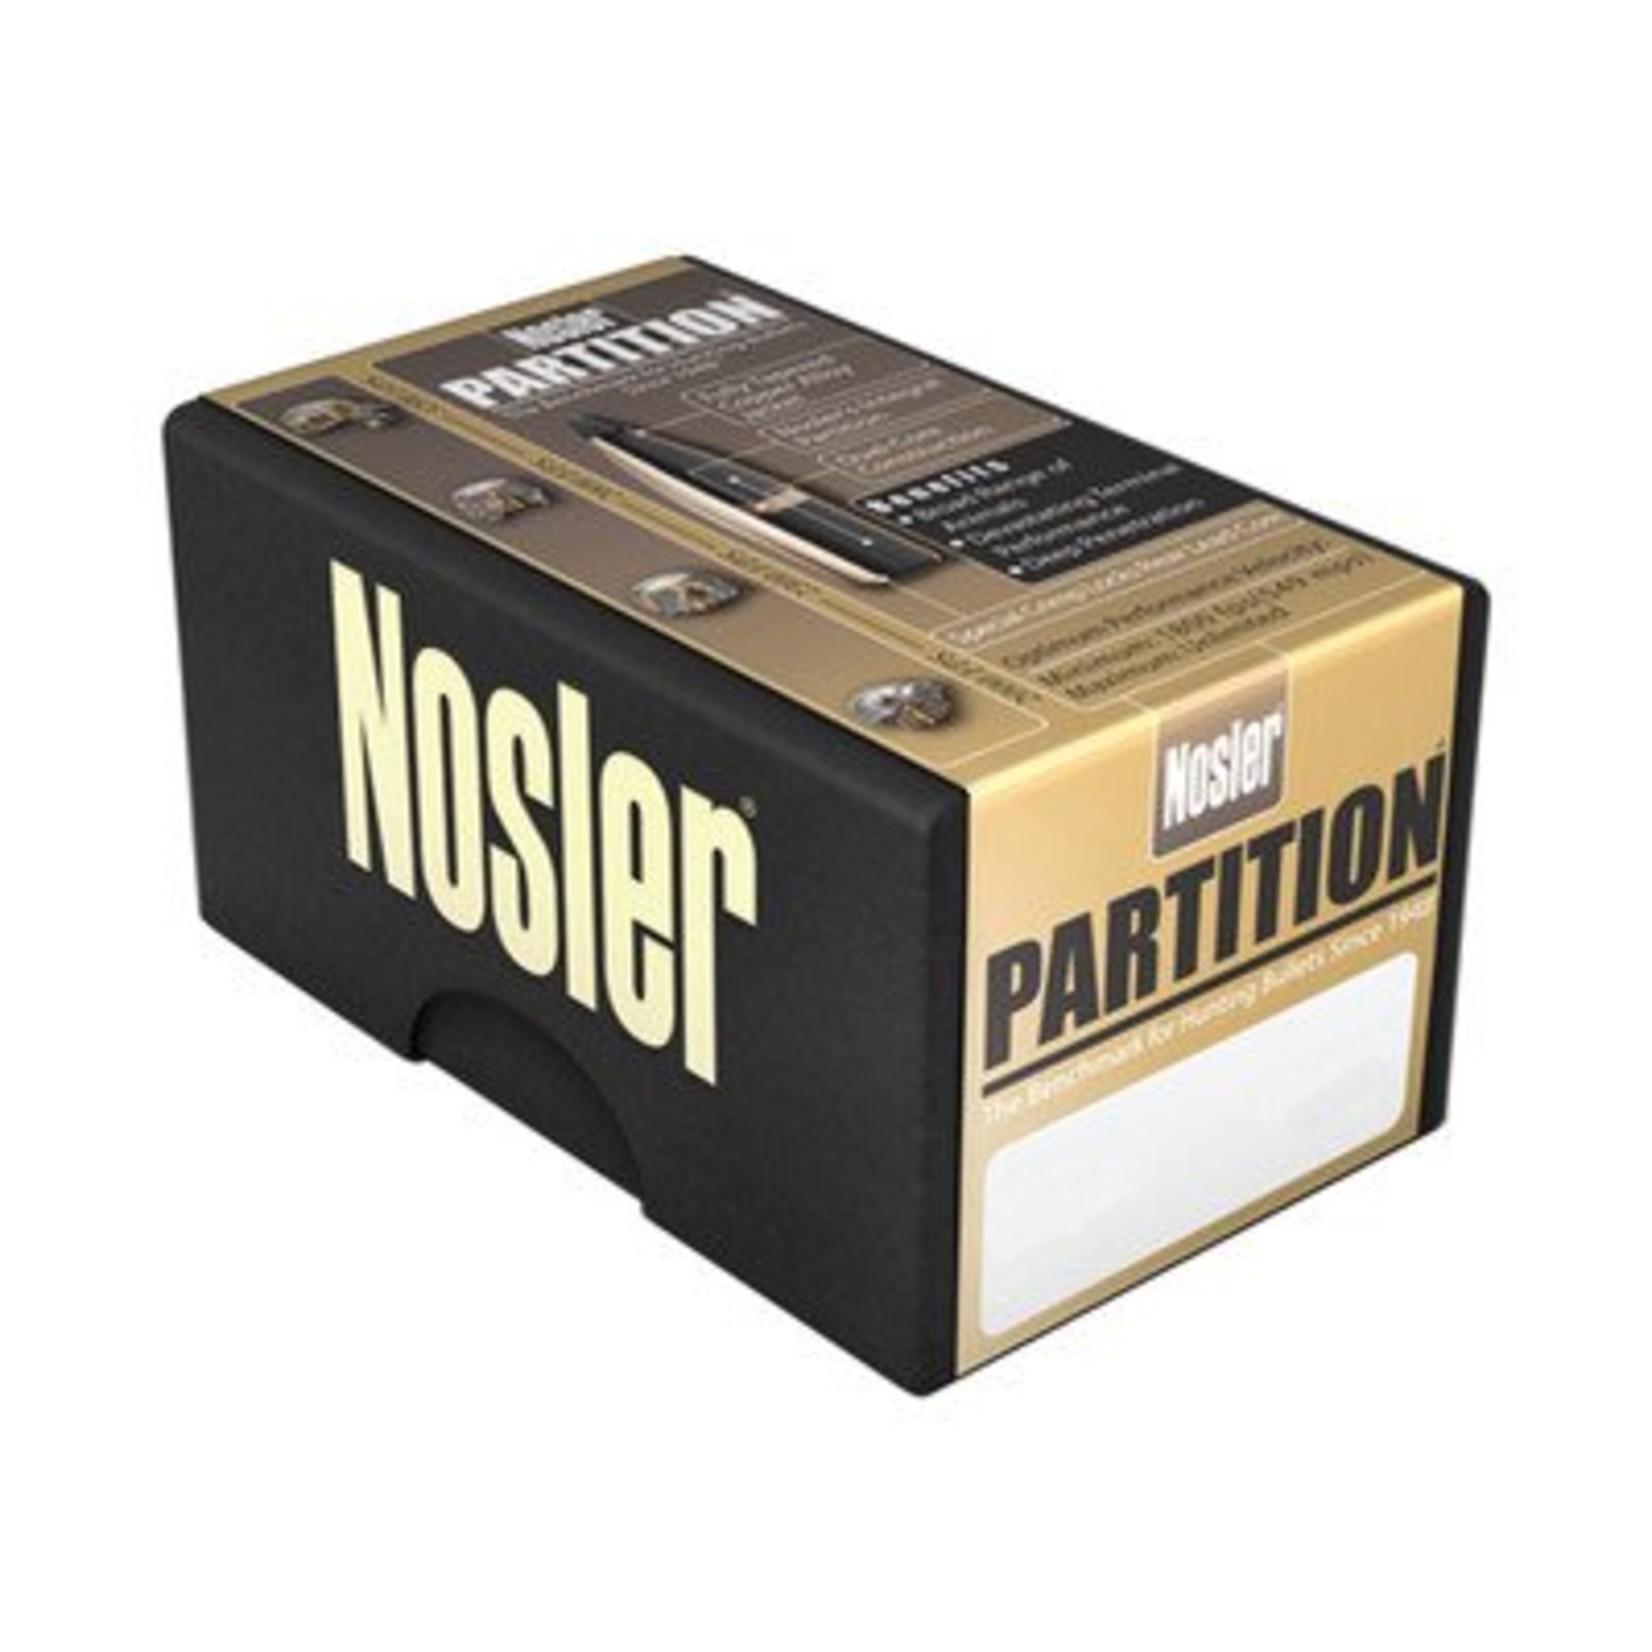 Nosler Partition Bullets (50-Count)